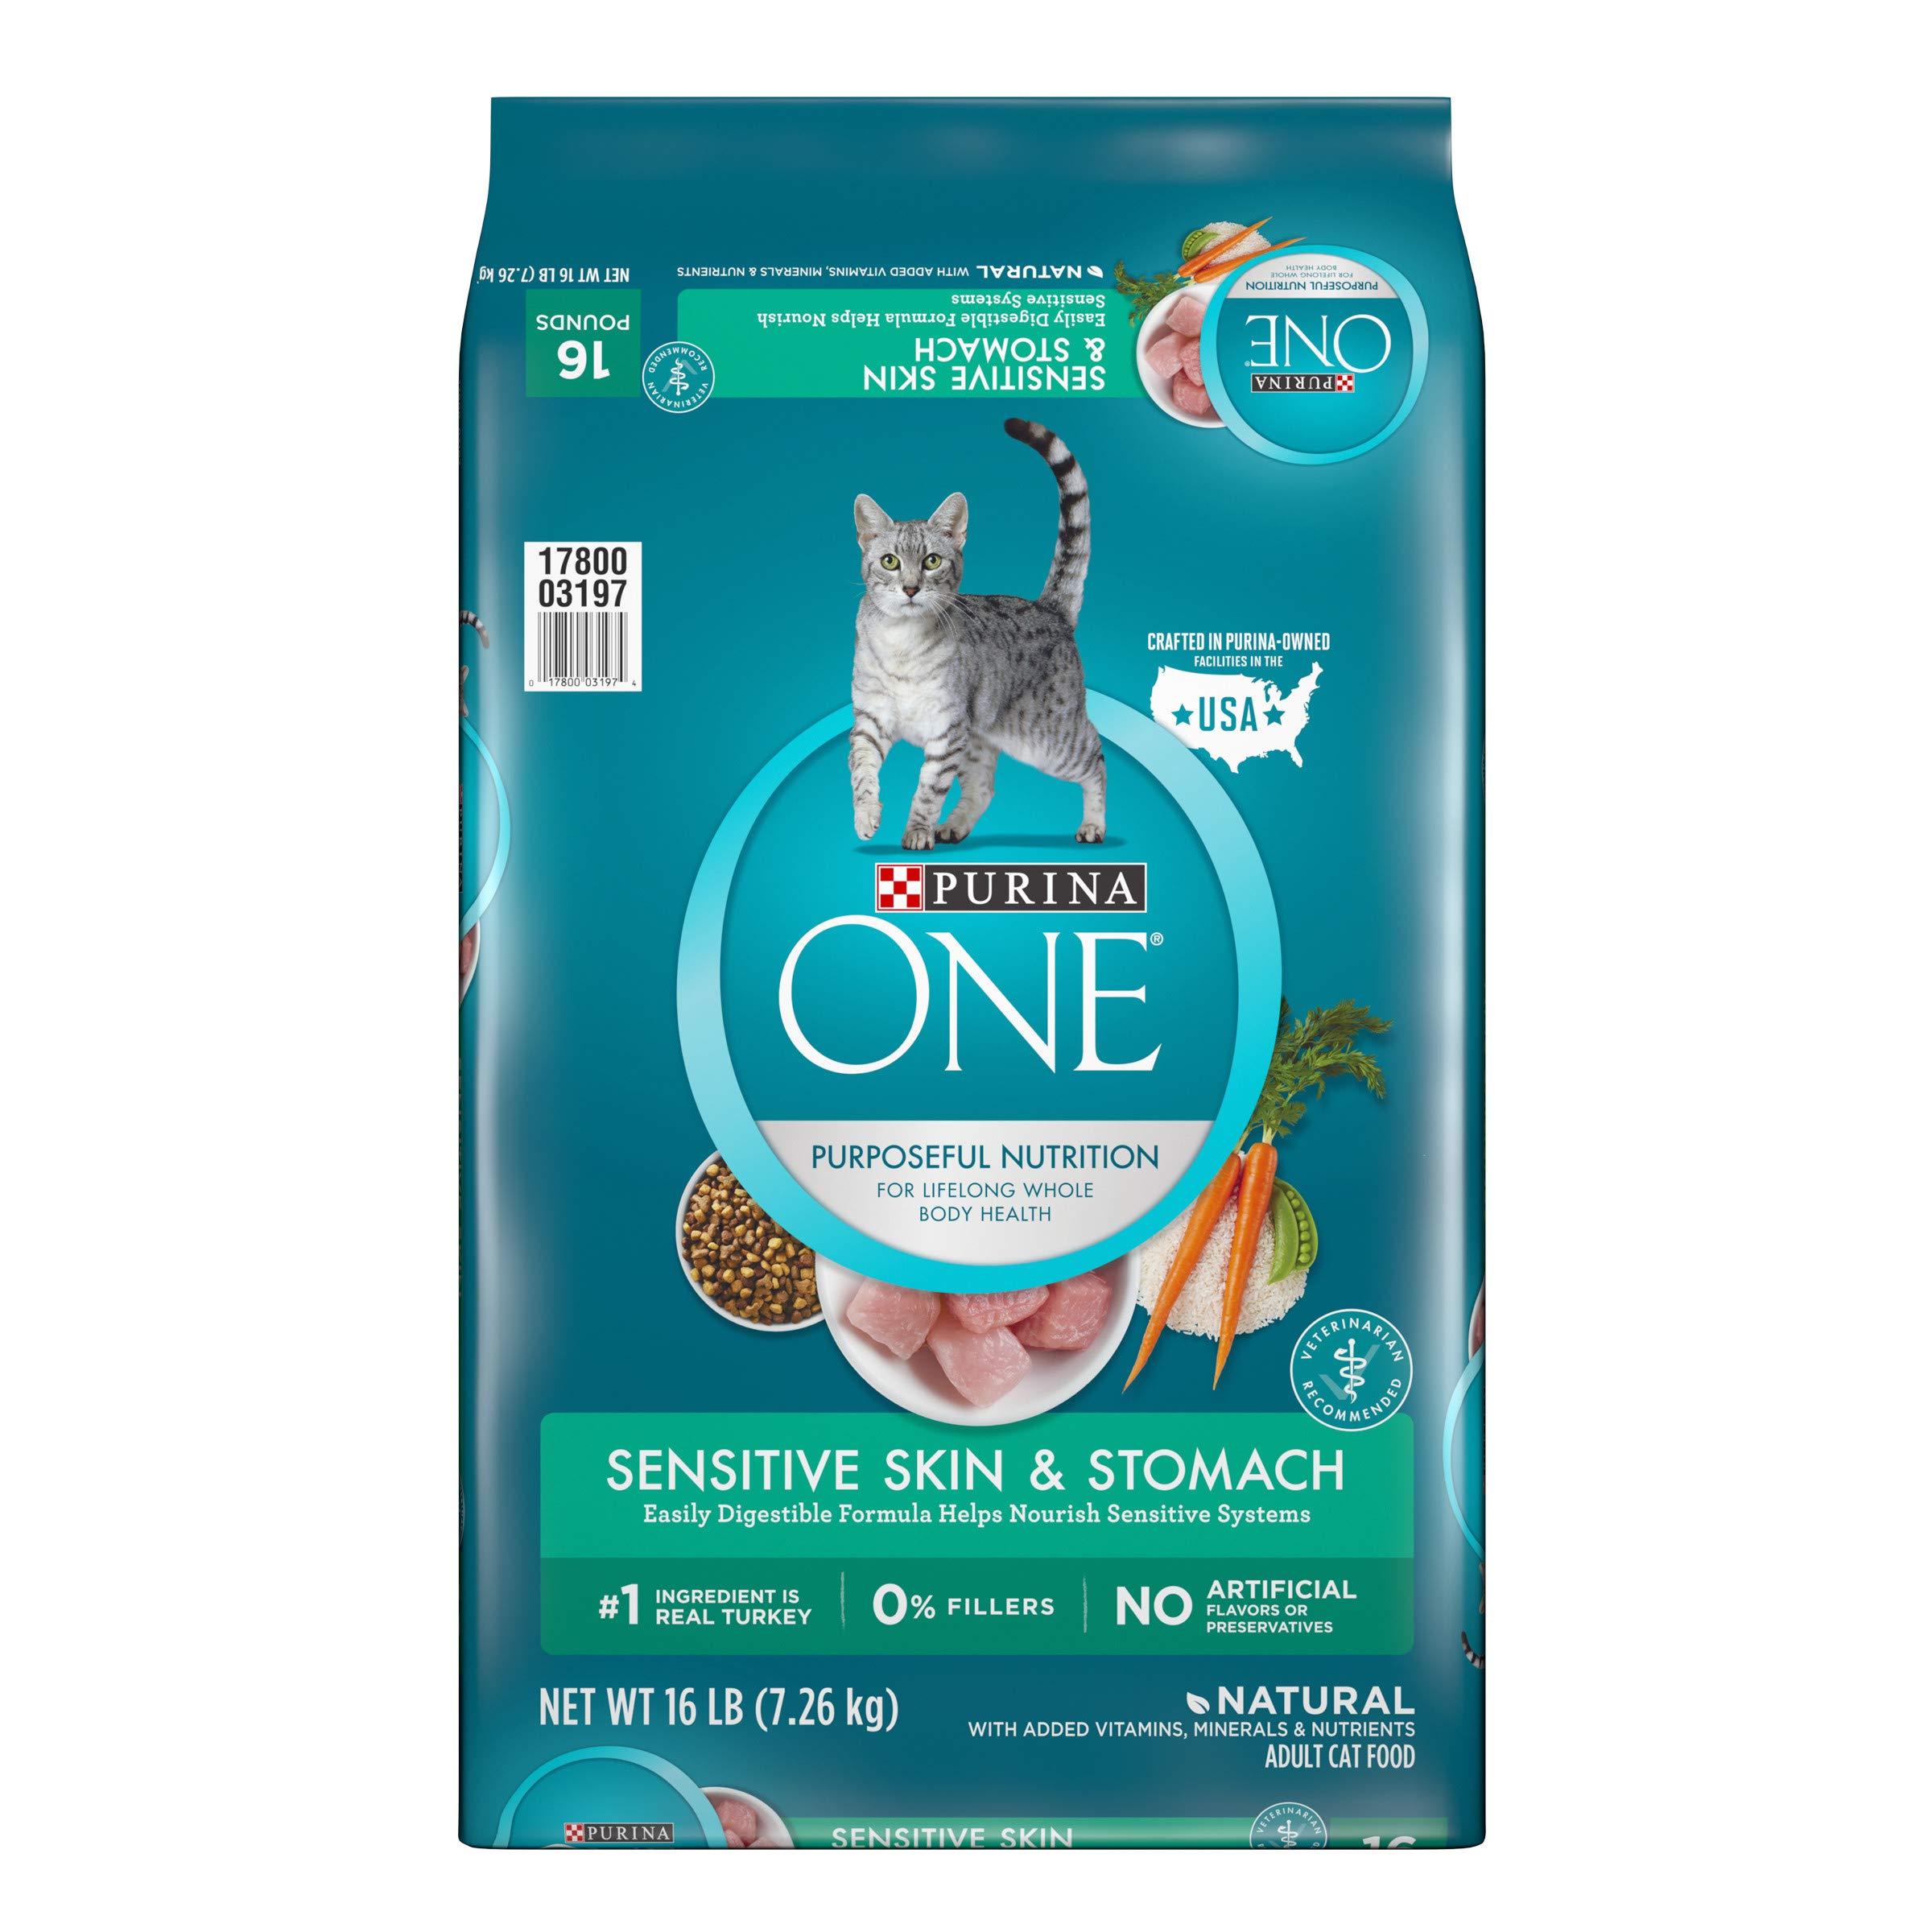 Purina ONE Sensitive Stomach, Sensitive Skin, Natural Dry Cat Food; Sensitive Skin & Stomach Formula - 16 lb. Bag